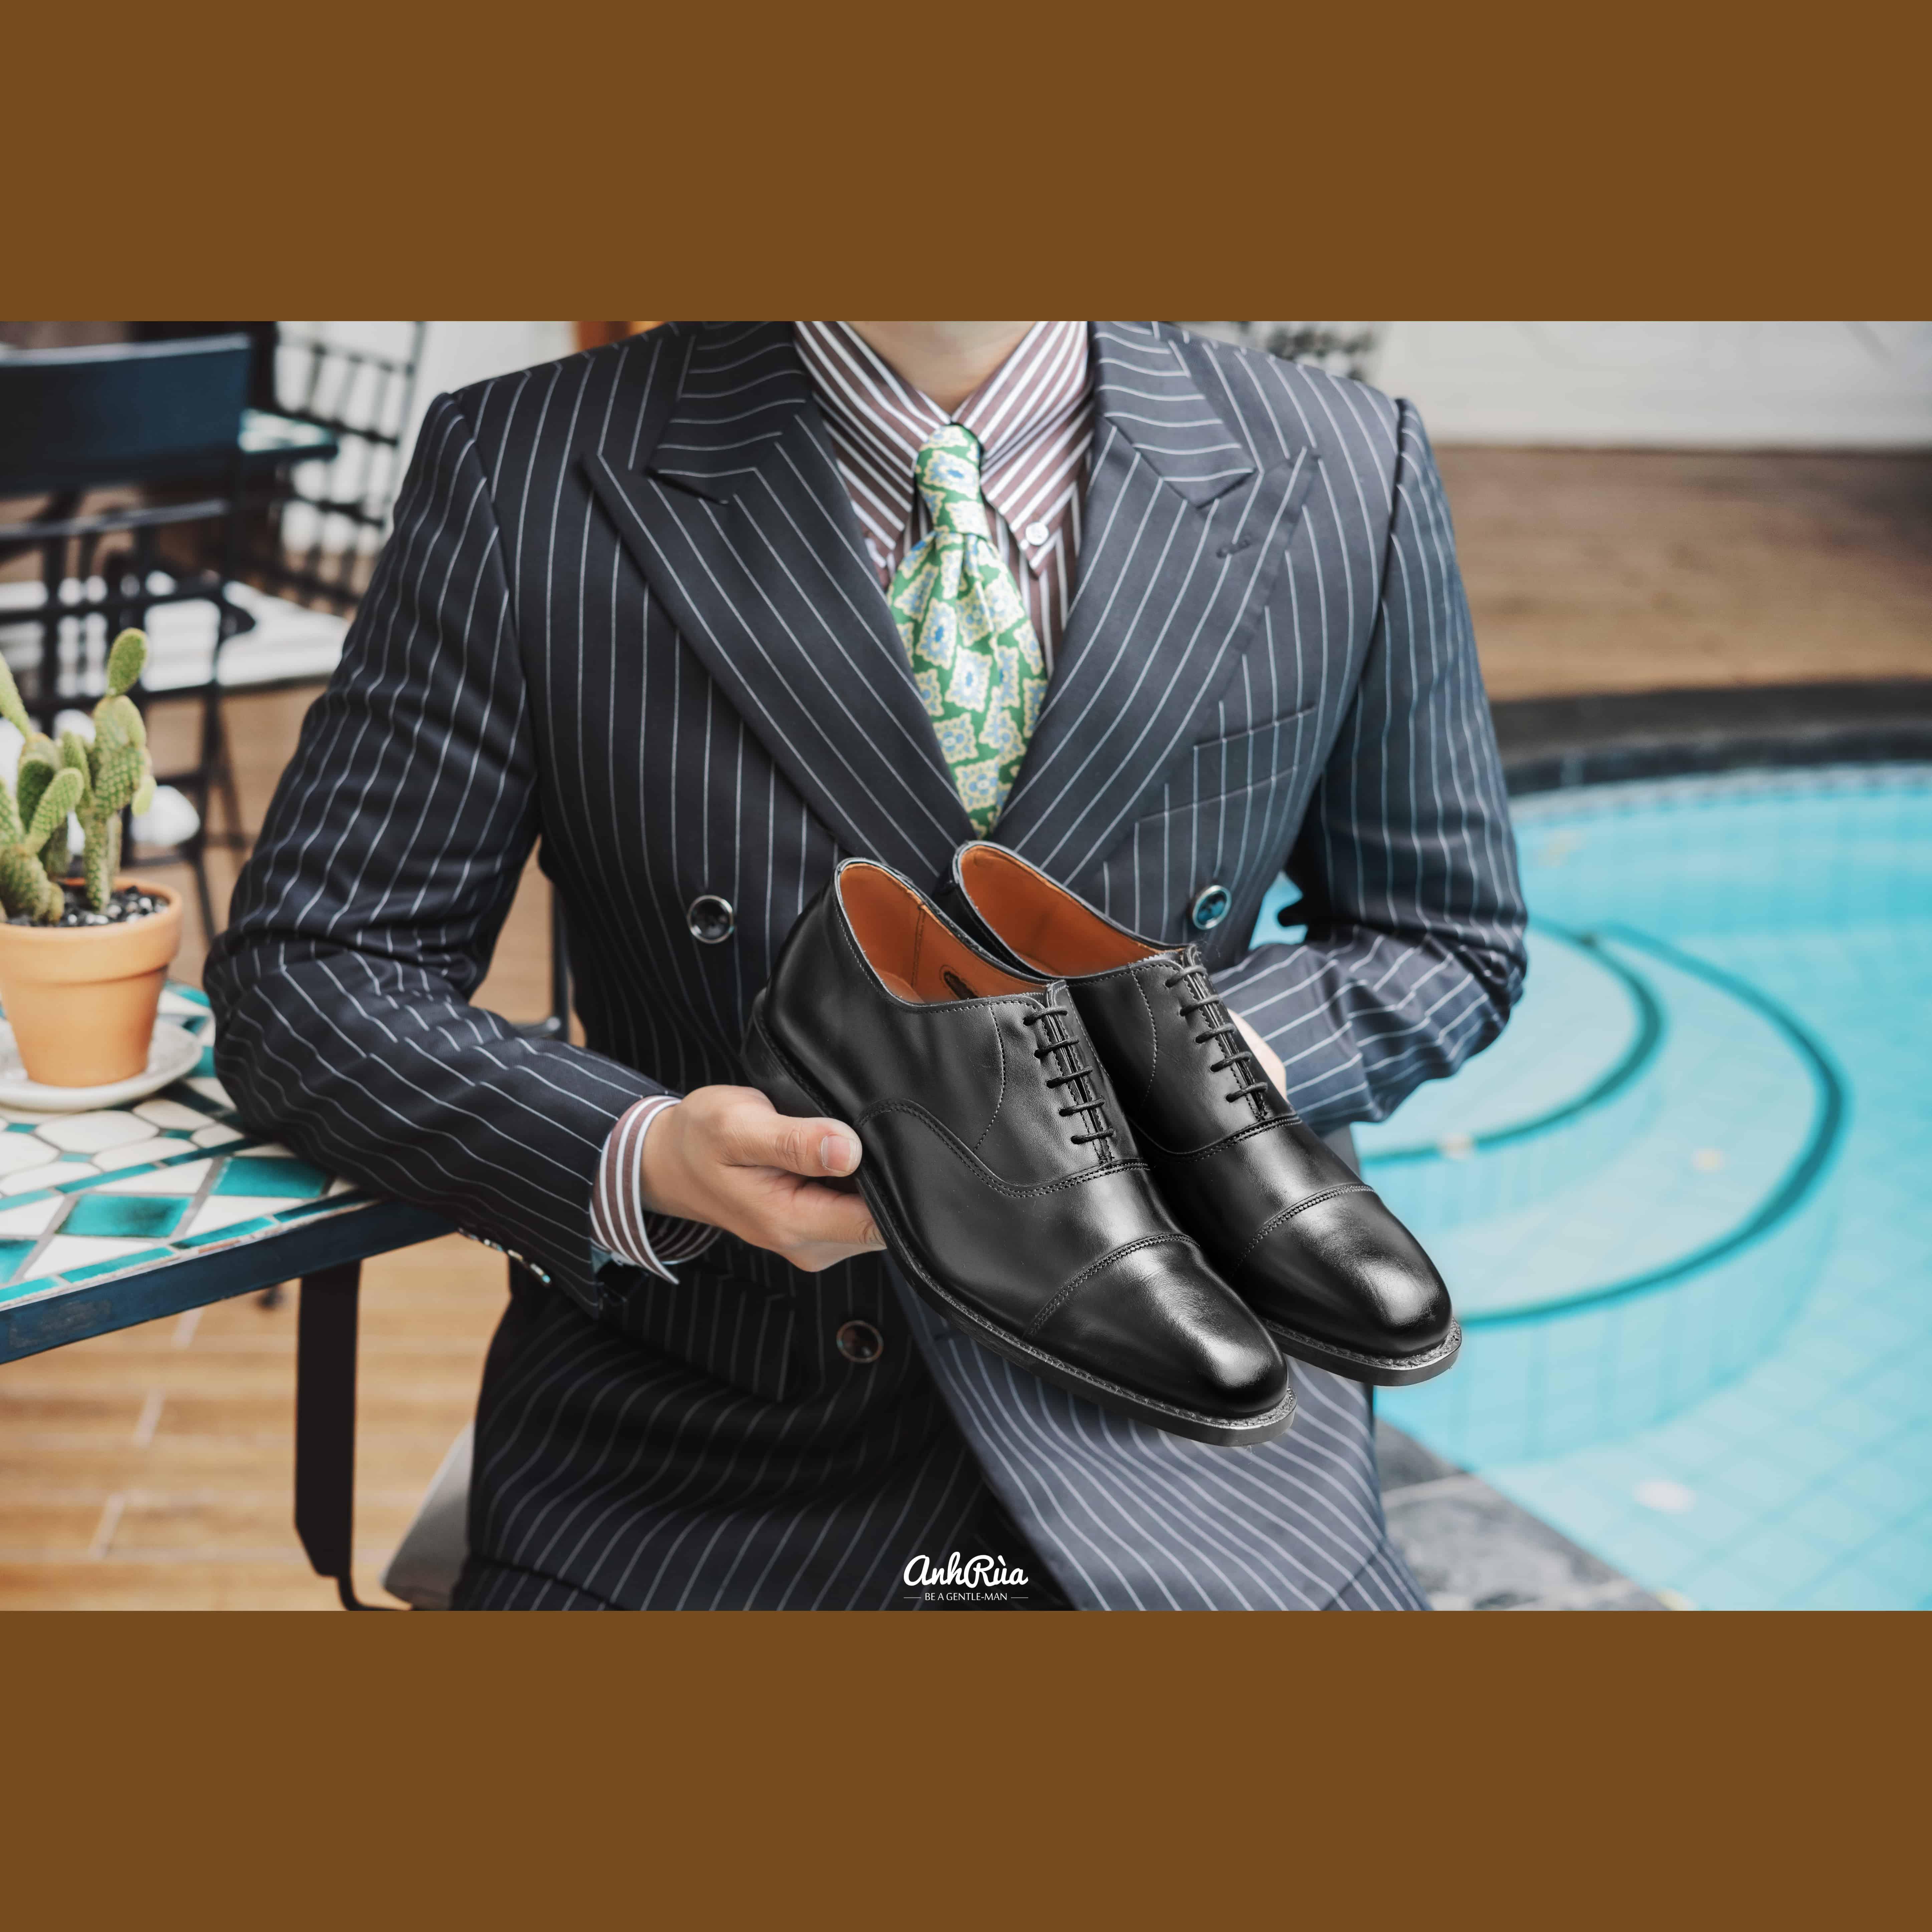 Giày Tây Nam Black Captoe Oxfords Allen Edmonds